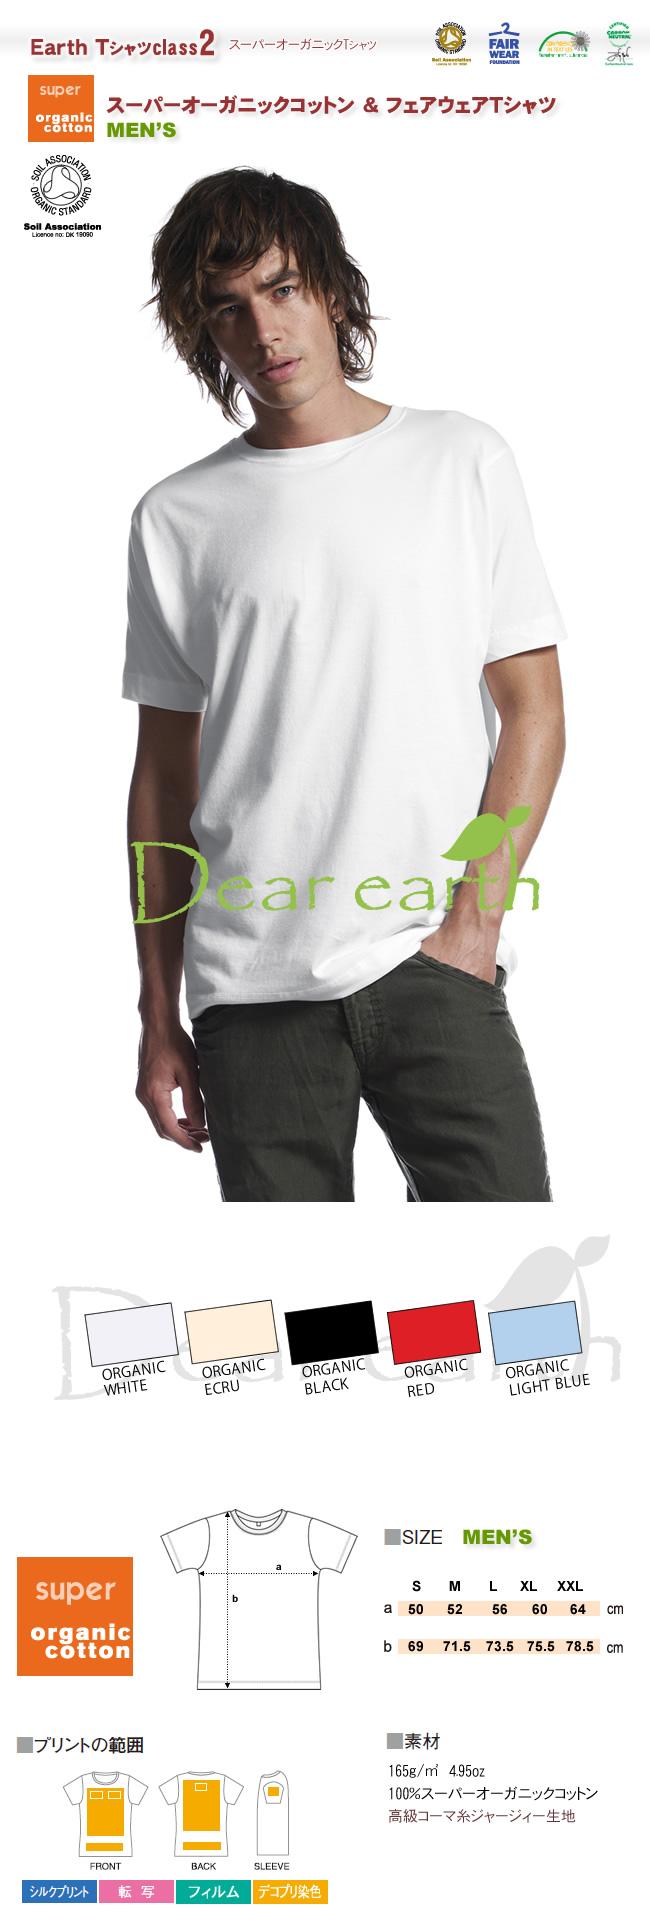 MEN'SアースTシャツclass2(EC03